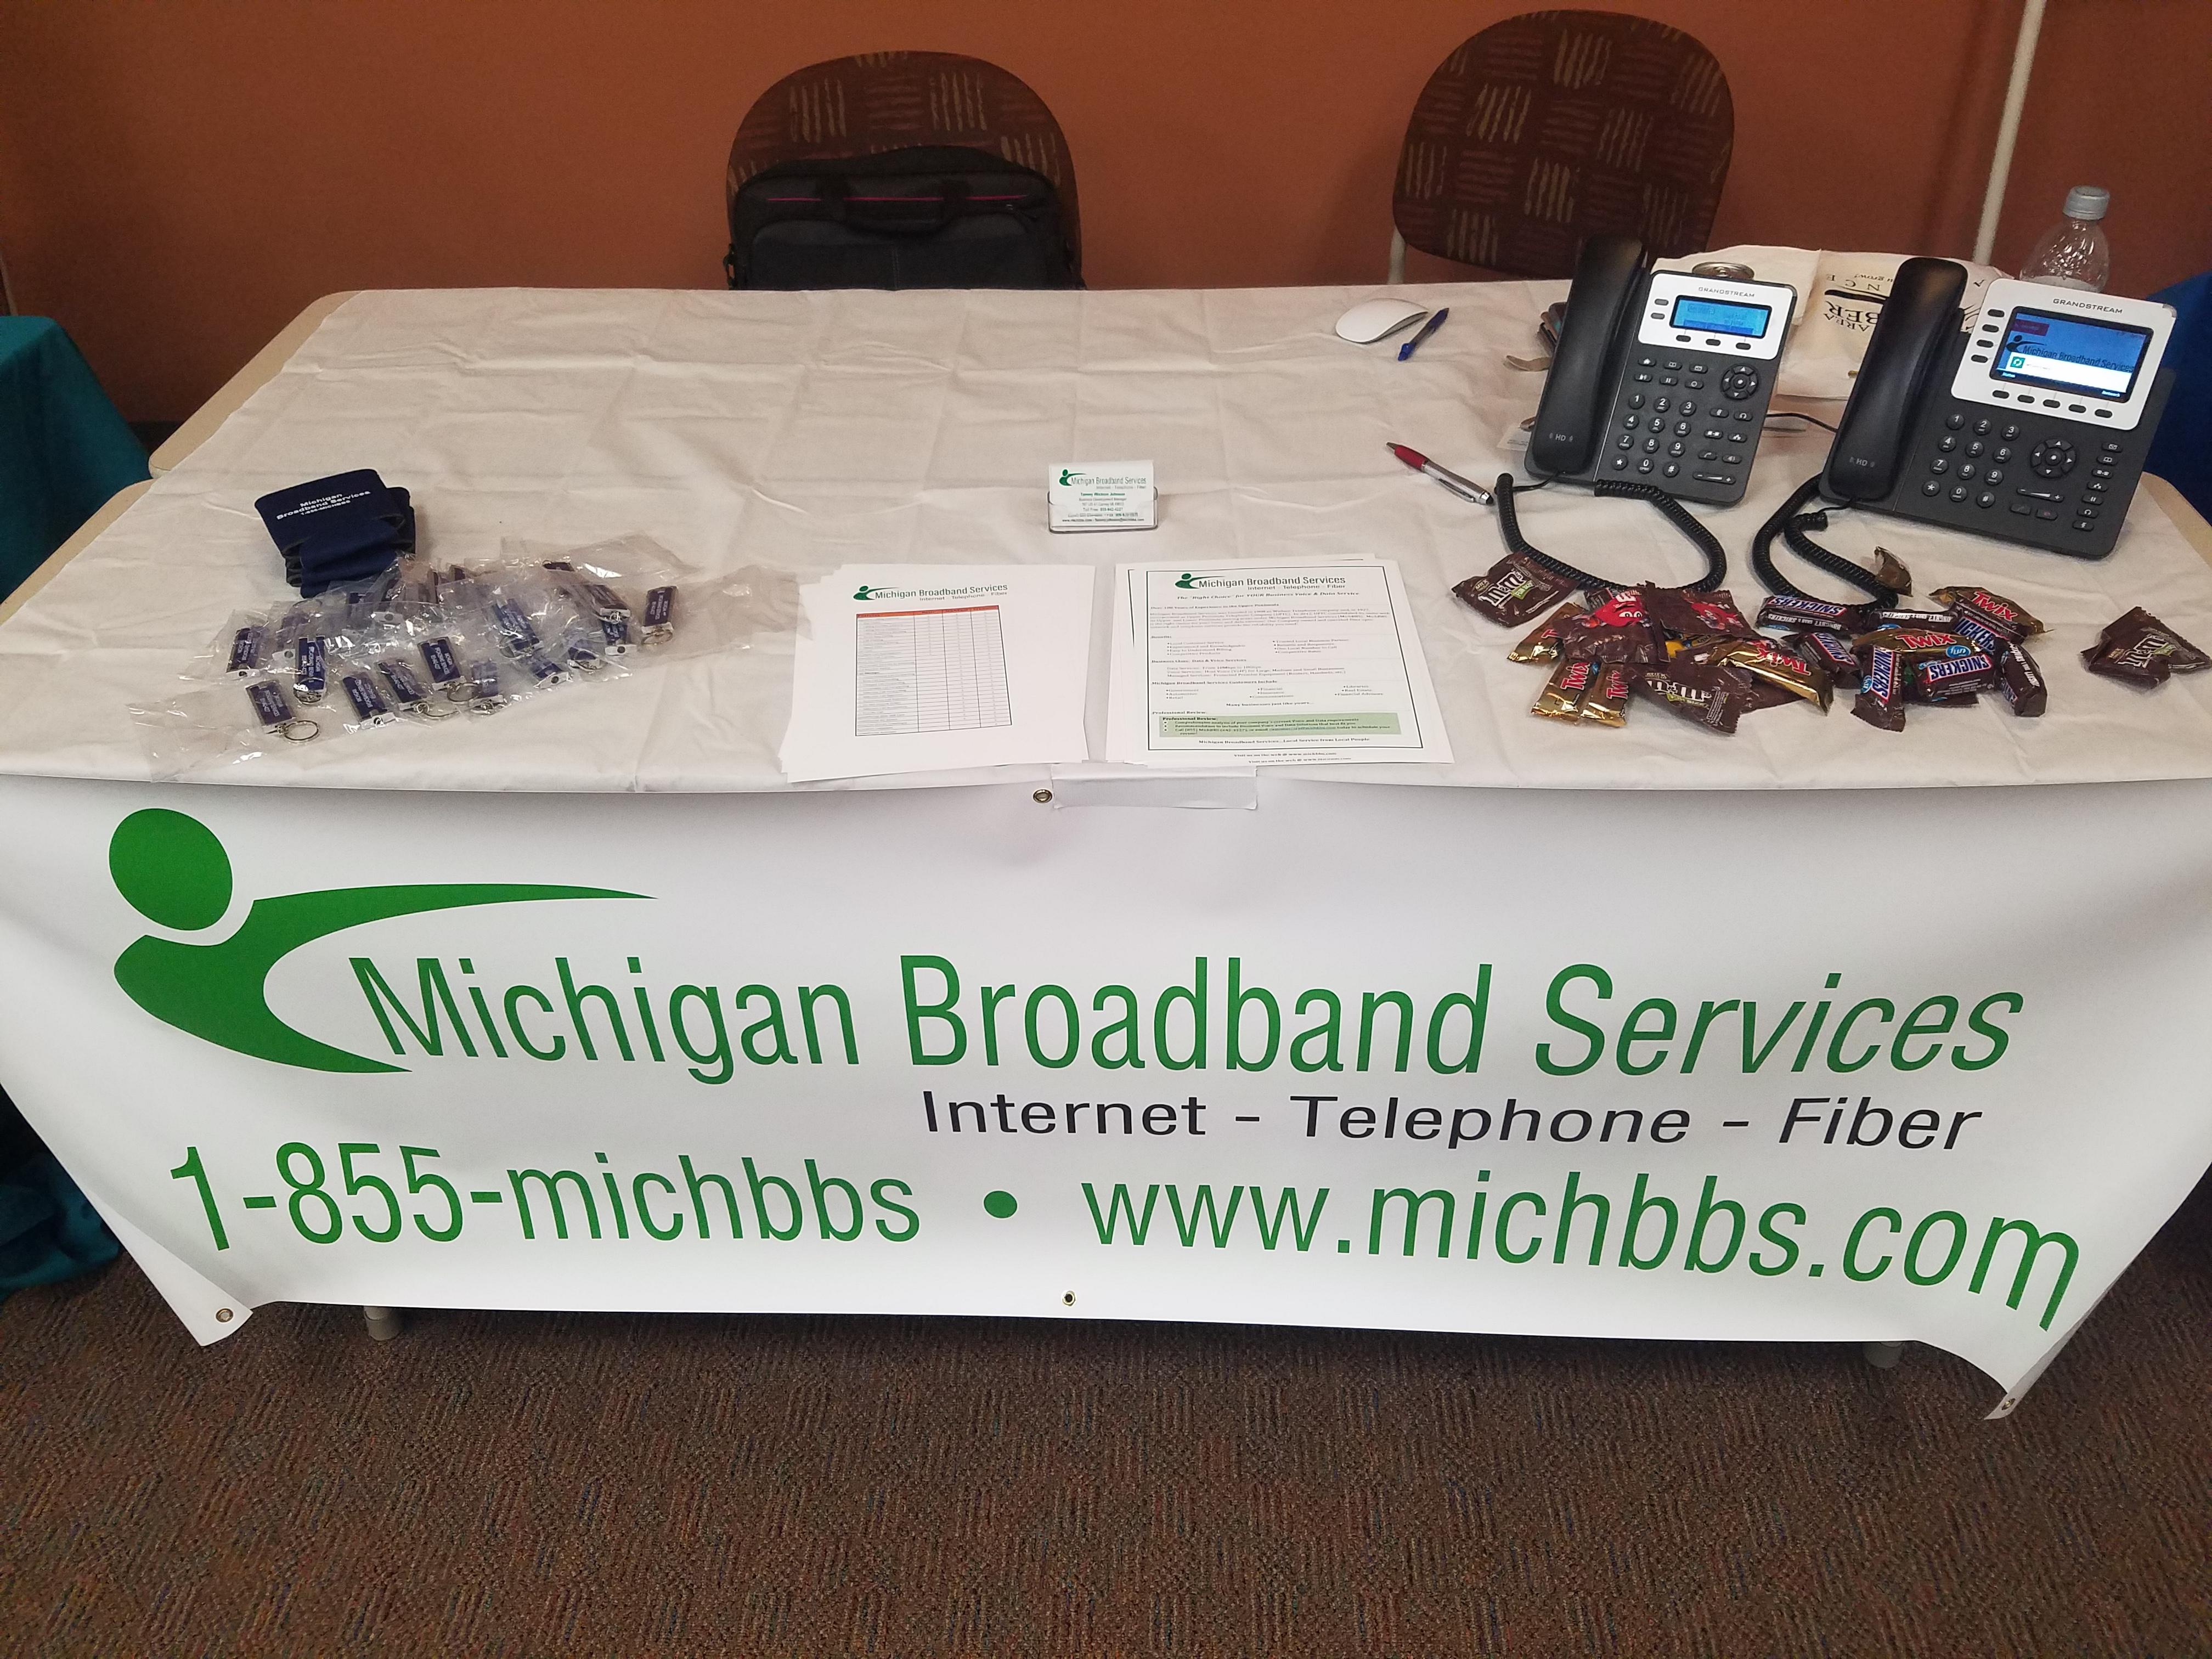 MI Broadband Services Expo